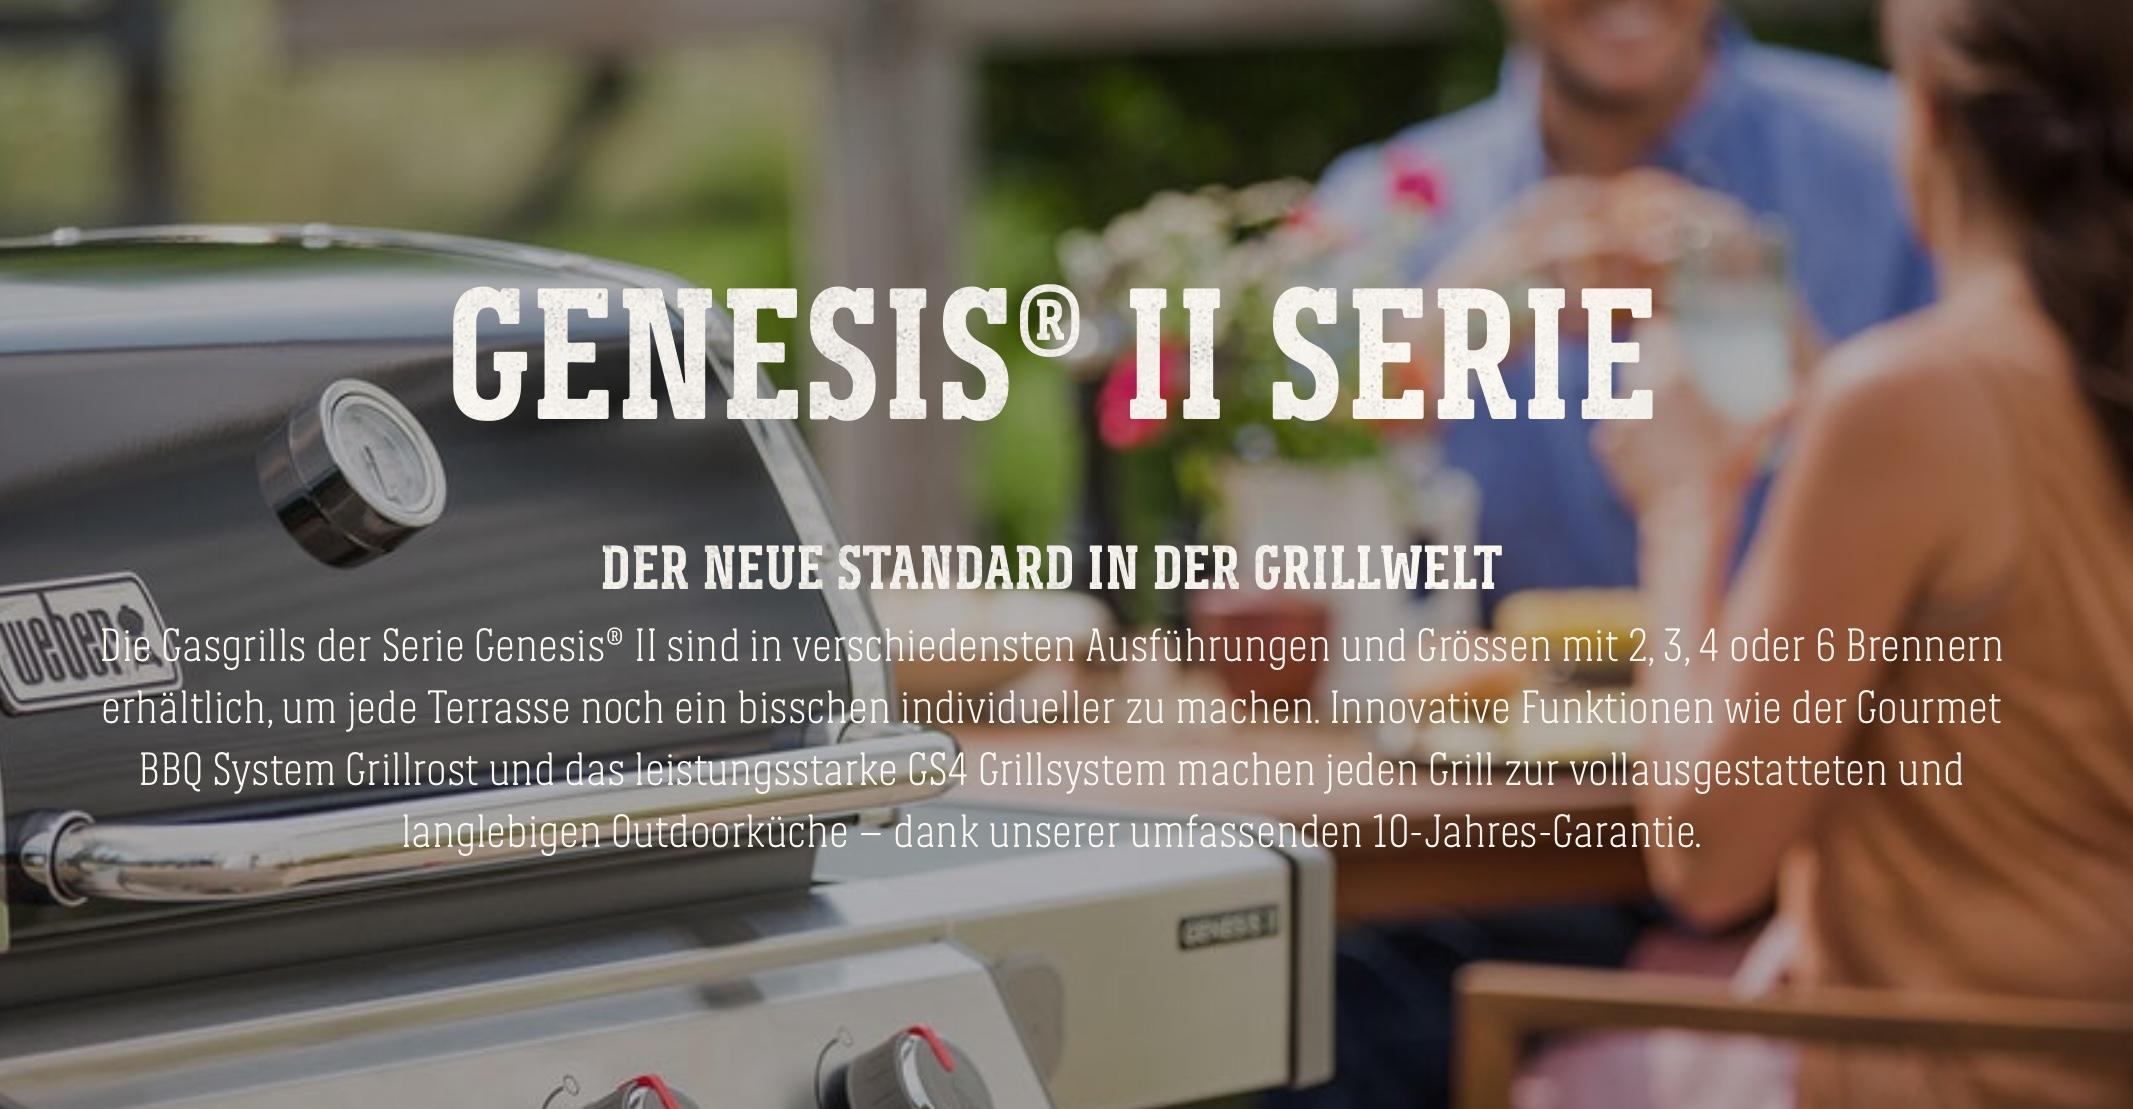 Outdoor Küche Weber Kugelgrill : Outdoorküche mit weber grill weber genesis ii sp gbs